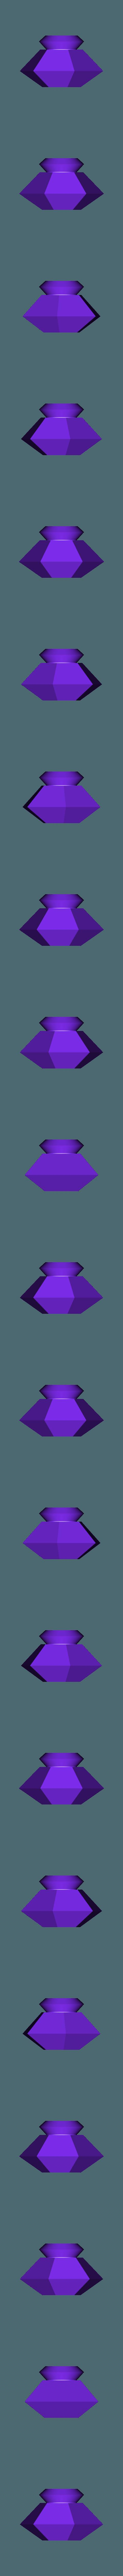 Diamond Charm.stl Download free STL file Charm Ring • 3D printable model, Lucy_Haribert